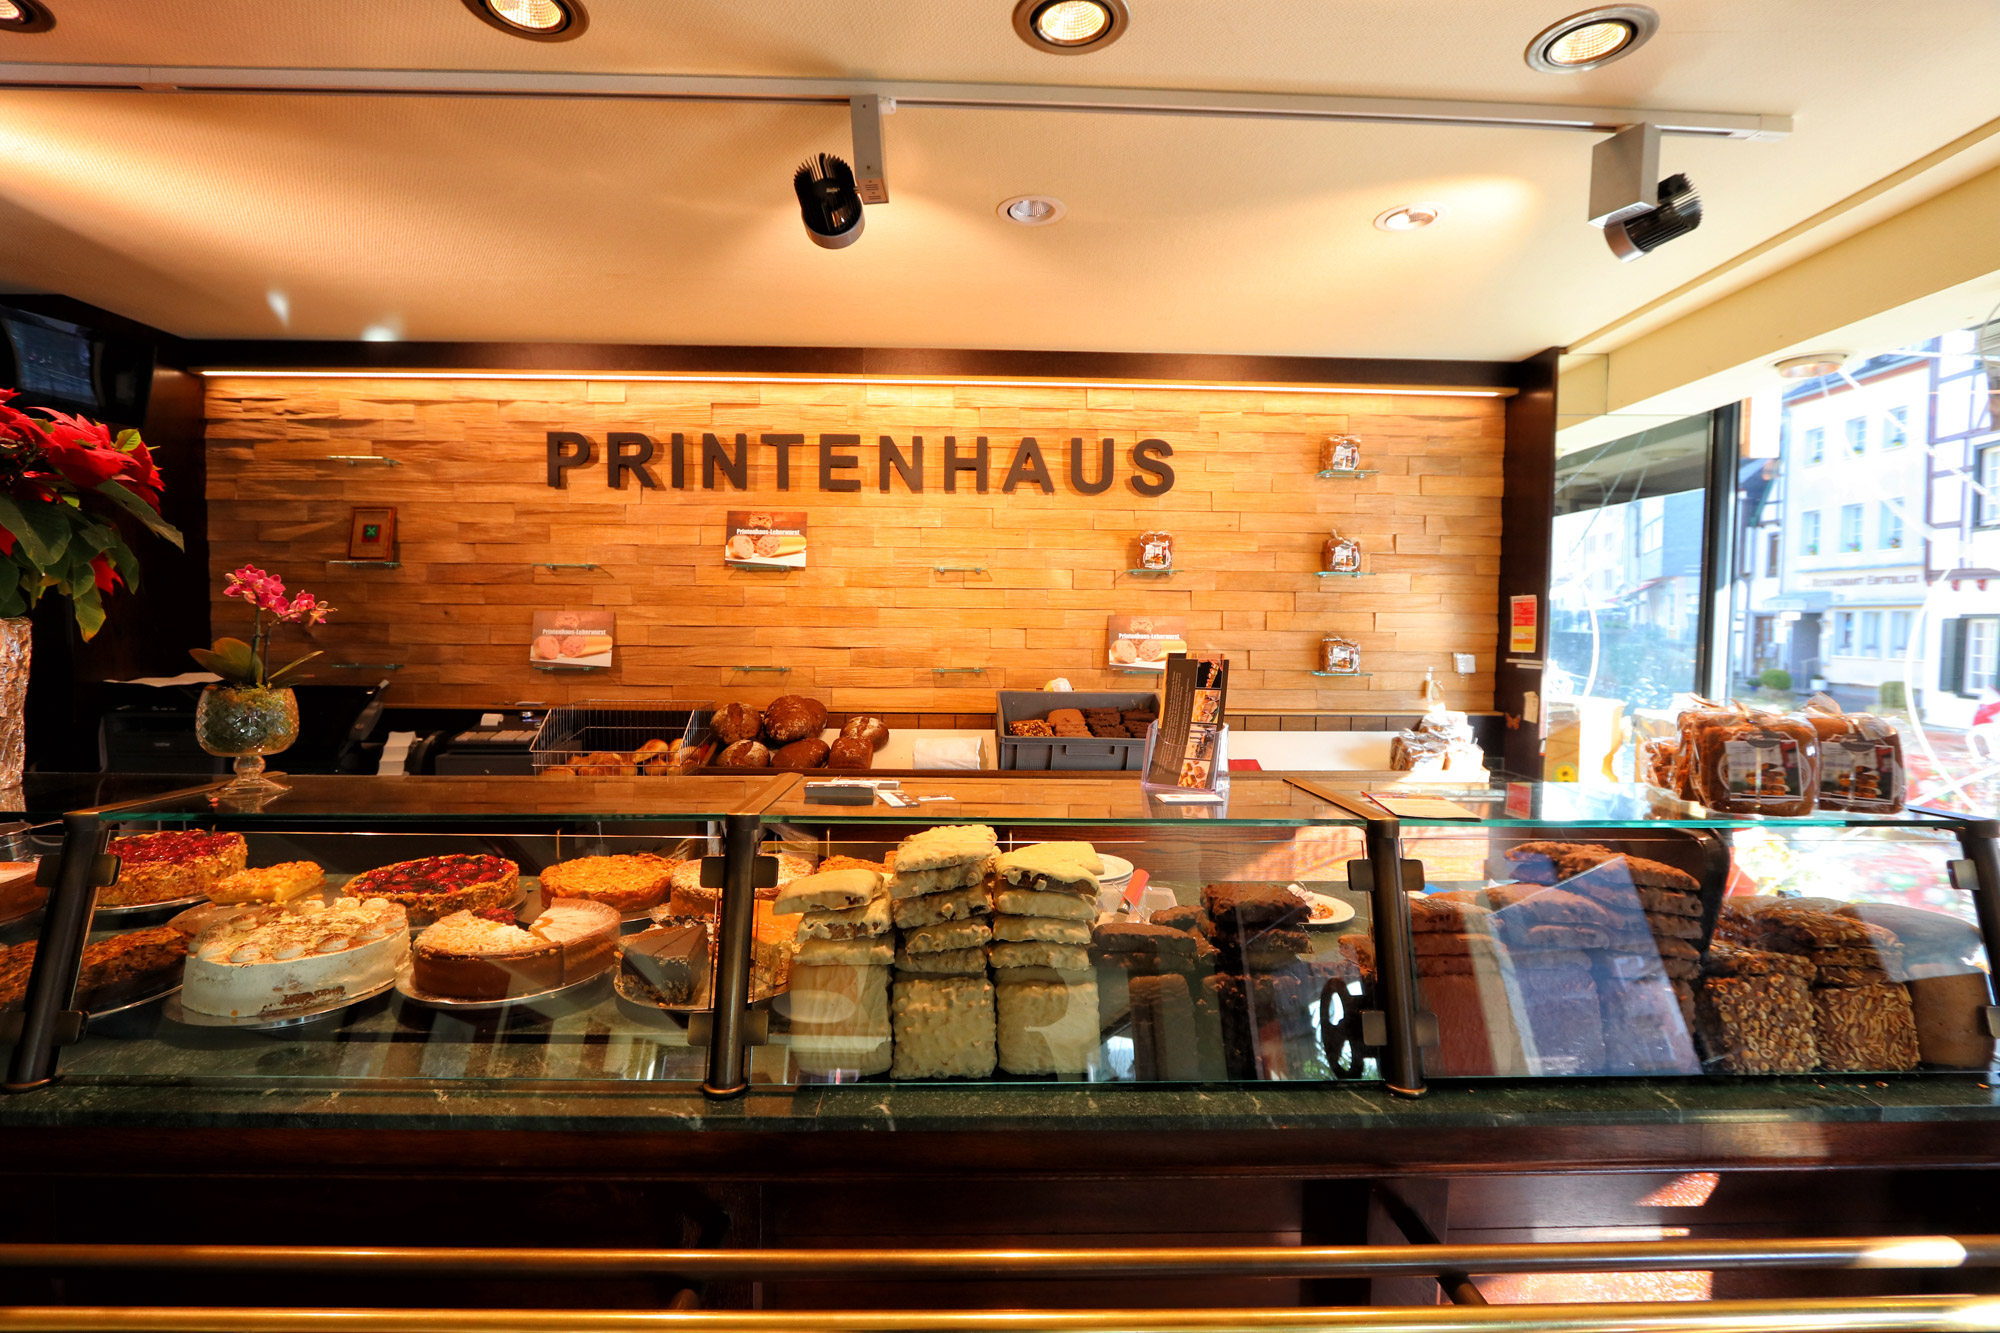 Bad Münstereifel - Printenhaus